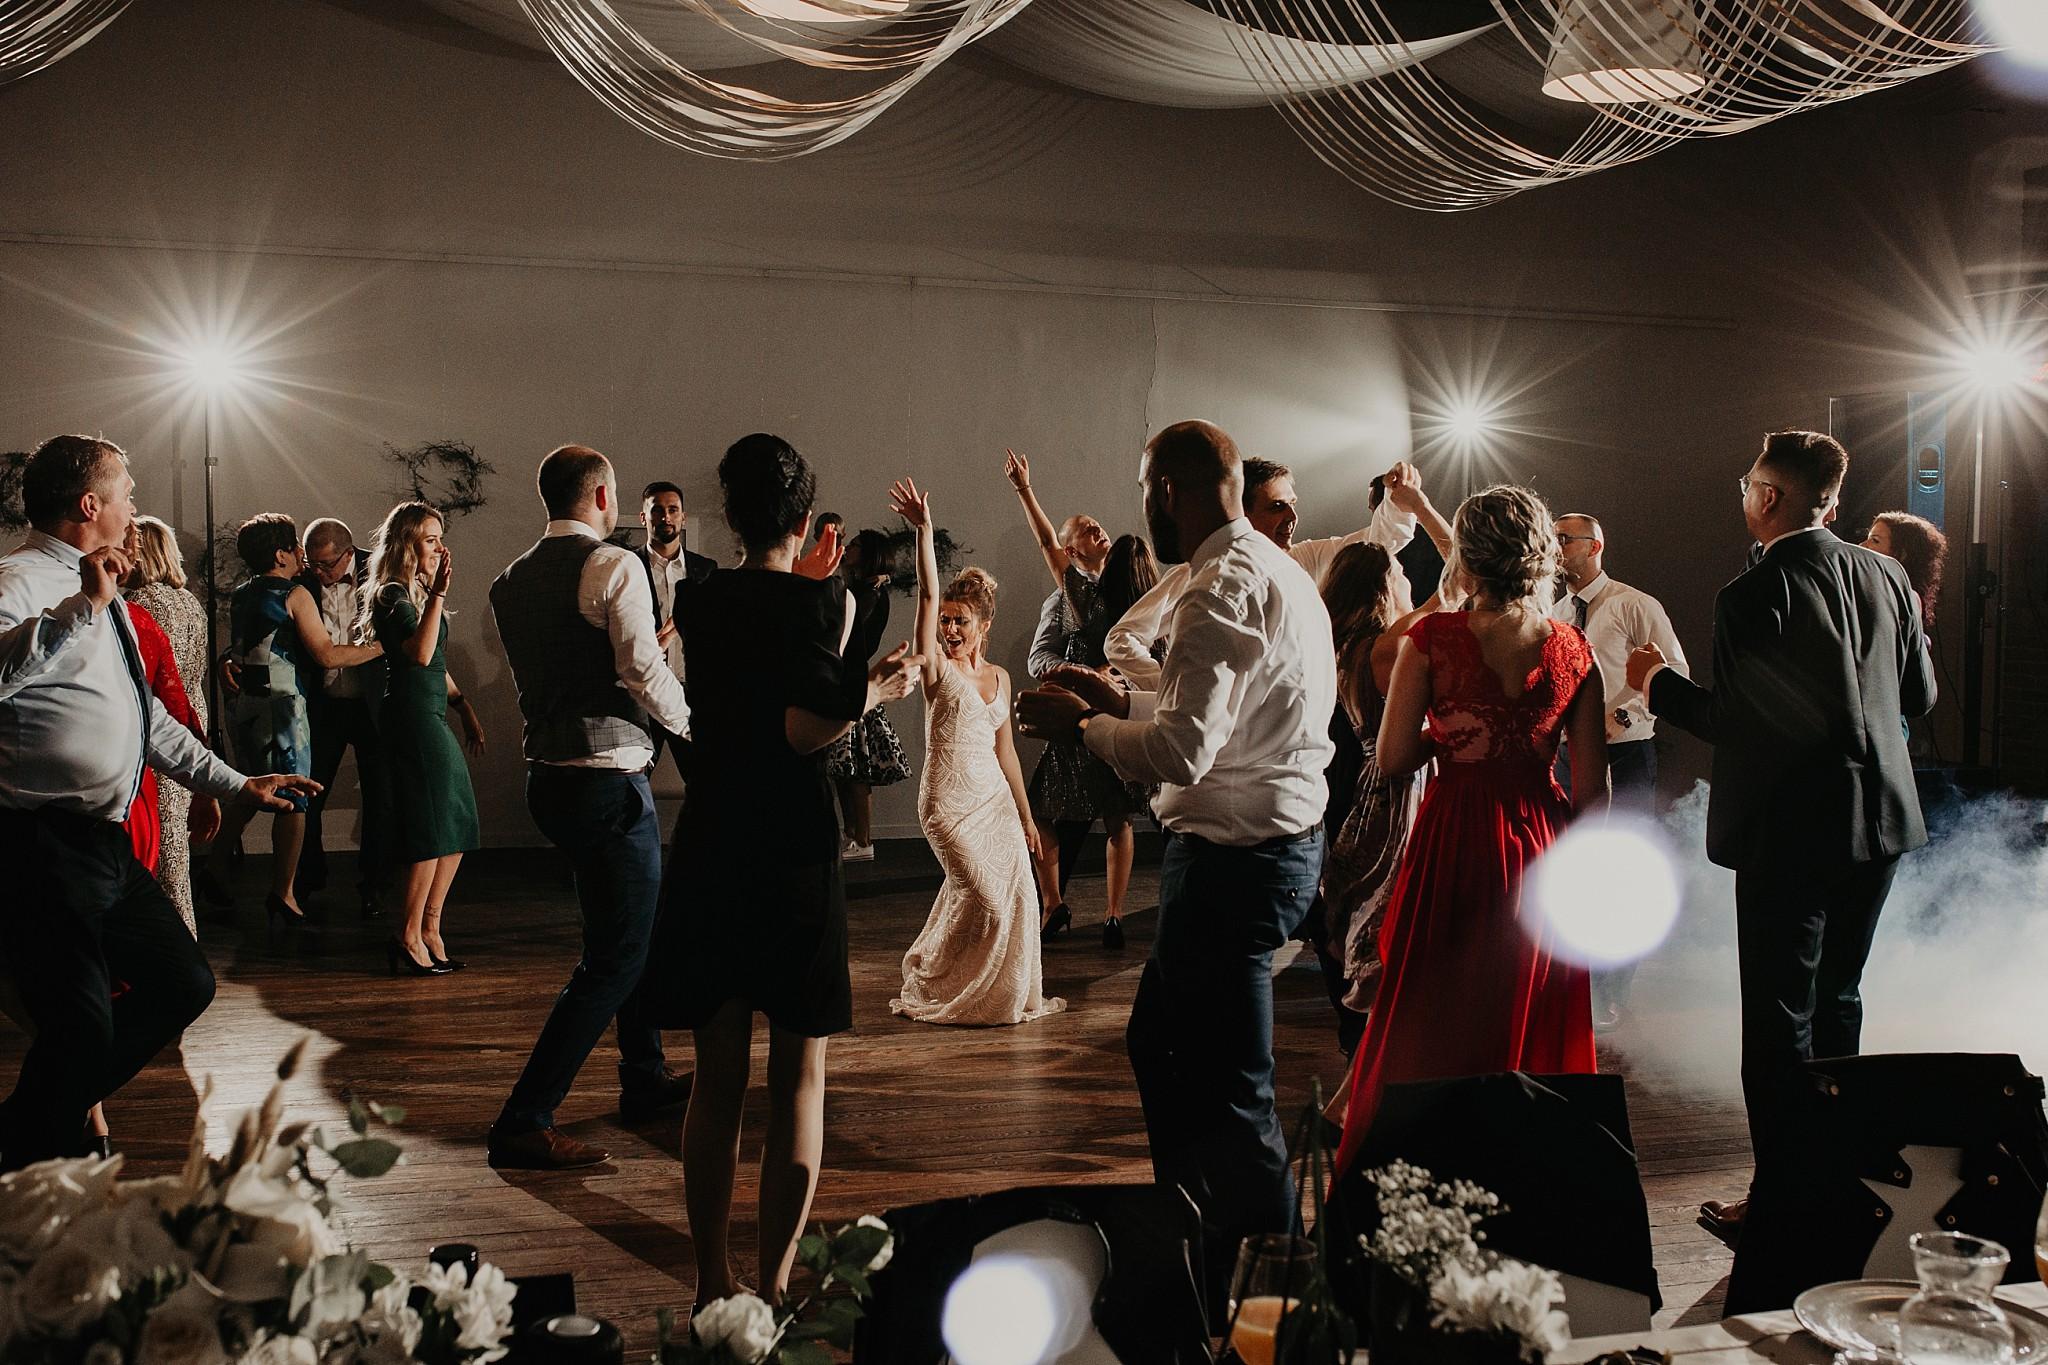 fotograf poznan wesele dobra truskawka piekne wesele pod poznaniem wesele w dobrej truskawce piekna para mloda slub marzen slub koronawirus slub listopad wesele koronawirus 431